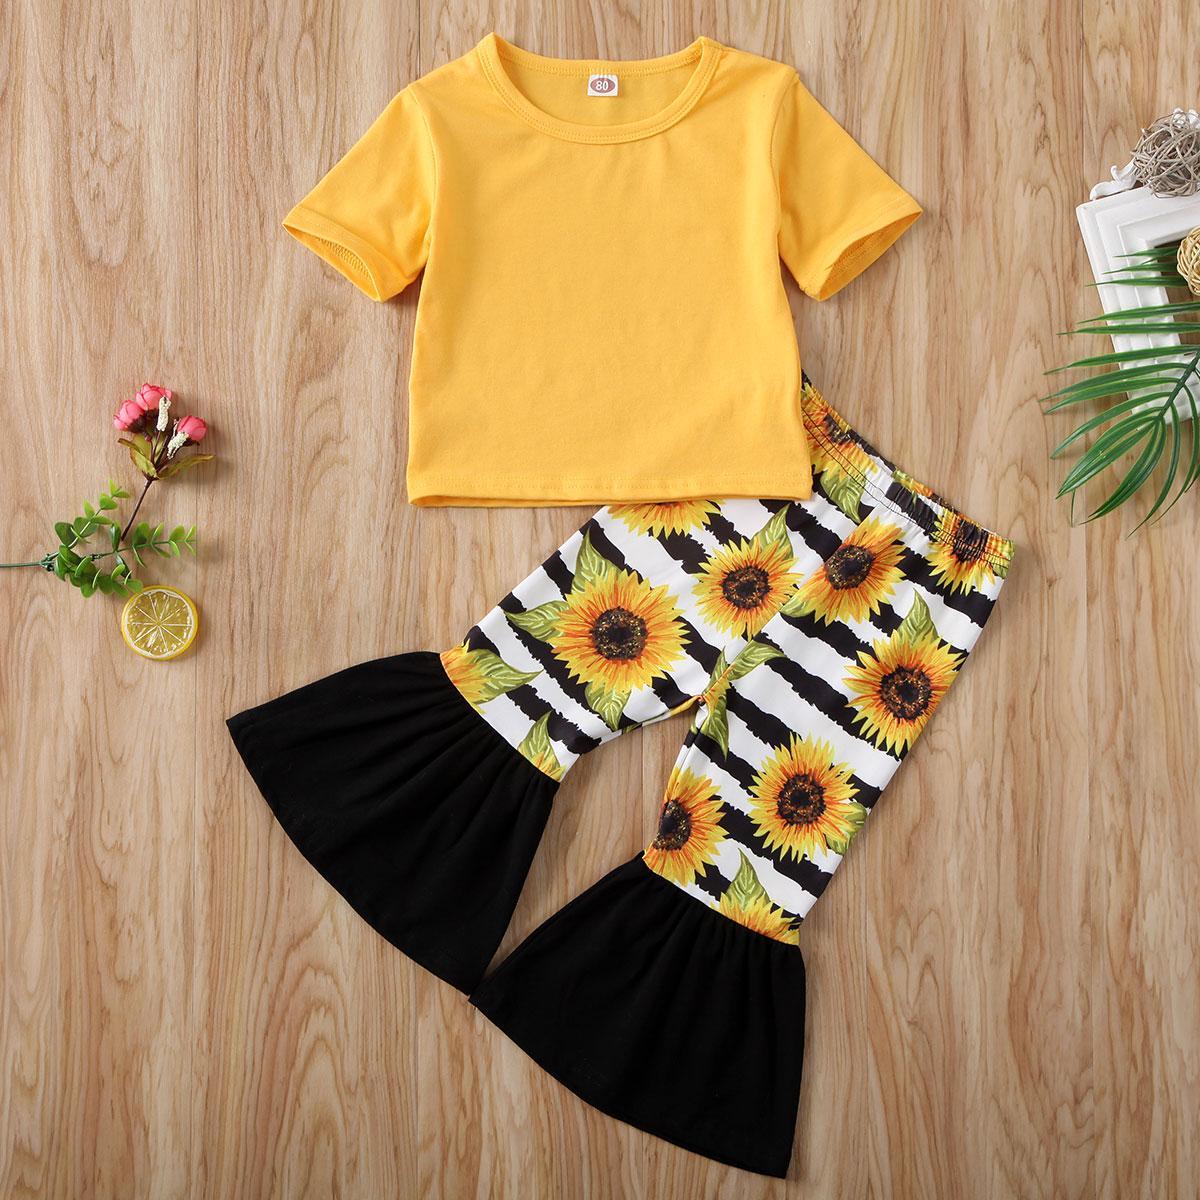 Pudcoco طفل طفلة ملابس قصيرة الأكمام T-Shirt أعلى عباد الشمس طباعة سروال مقلم طويل 2PCS تتسابق الملابس المصنوعة من القطن